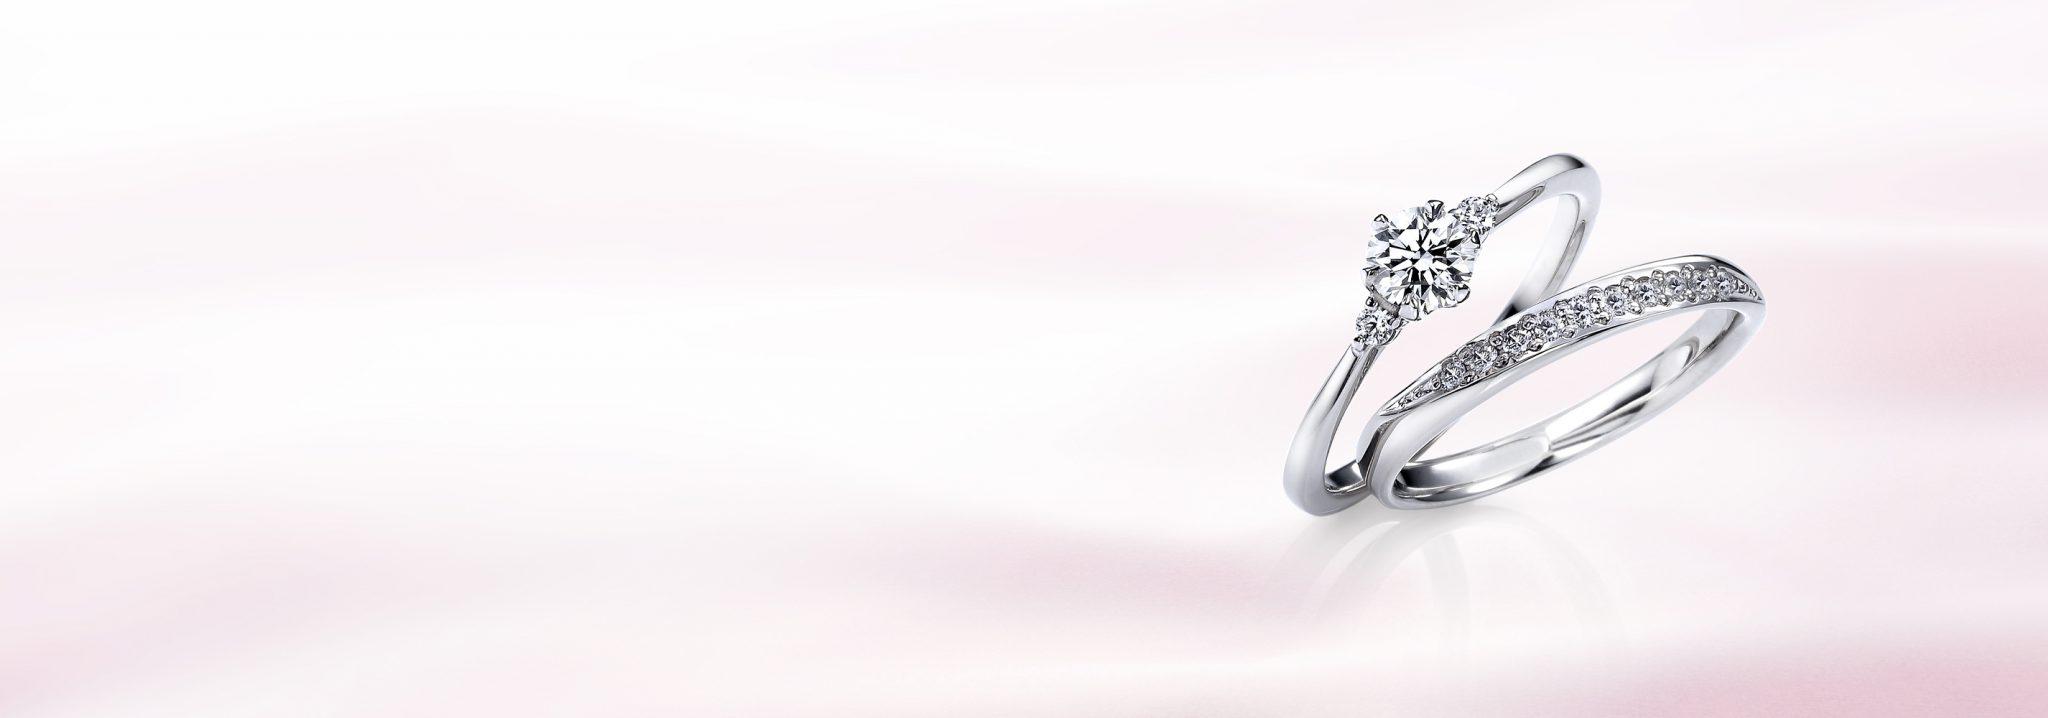 Set Ring (セットリング)